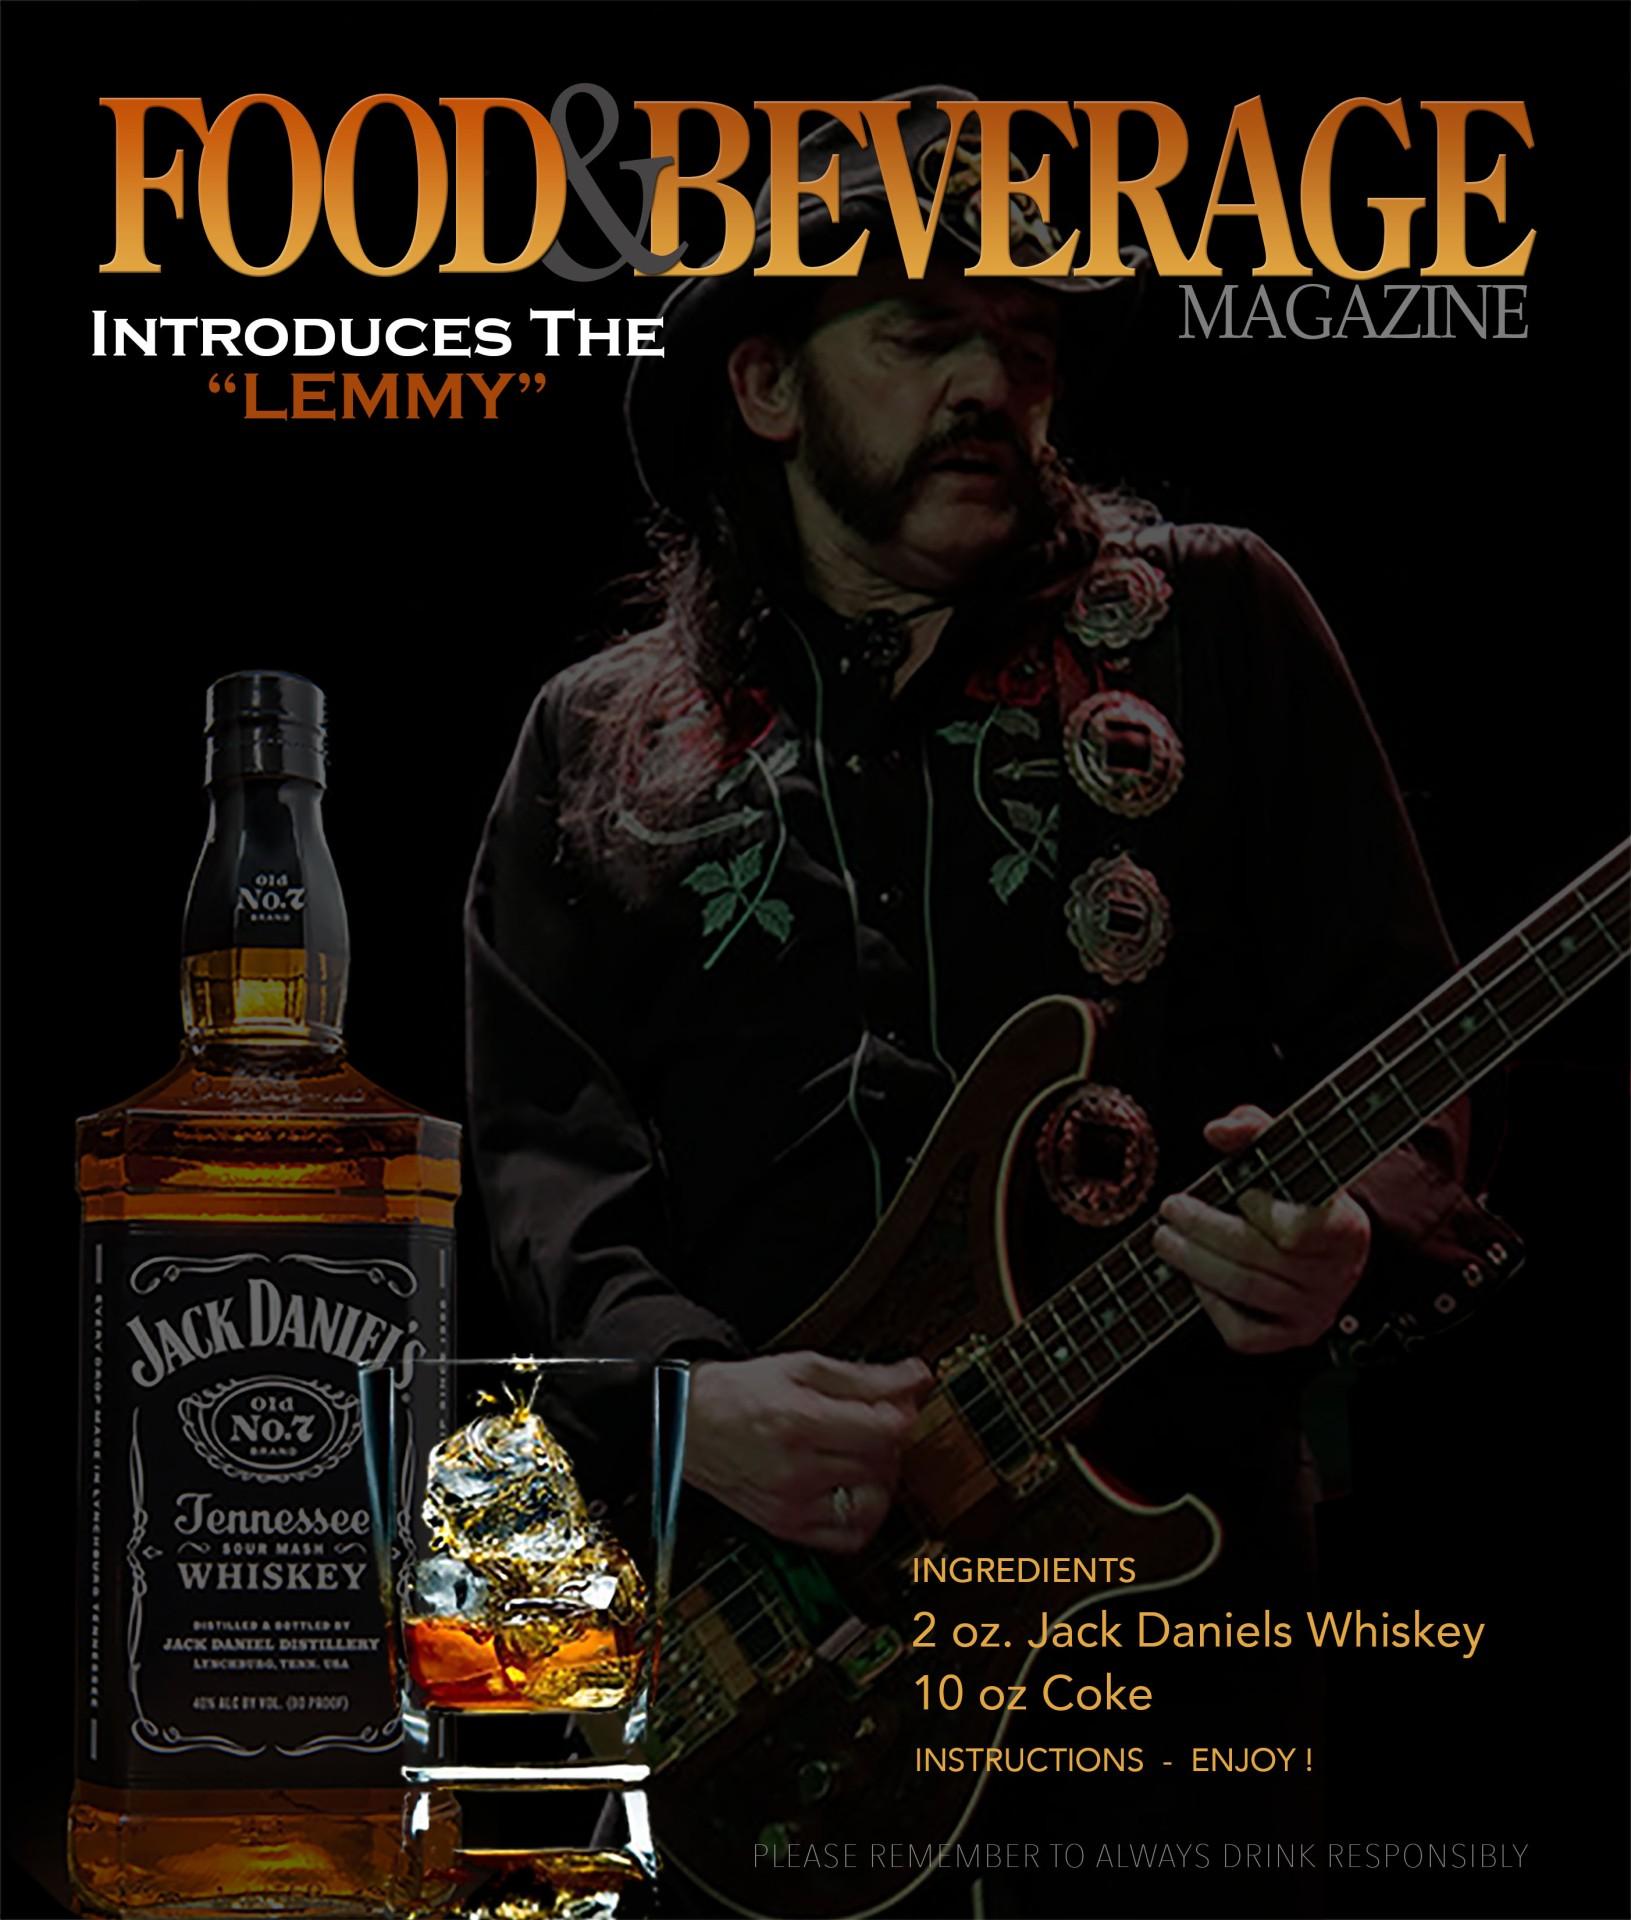 https://www.fb101.com/wp-content/uploads/2016/01/The-Lemmy1-2.jpg